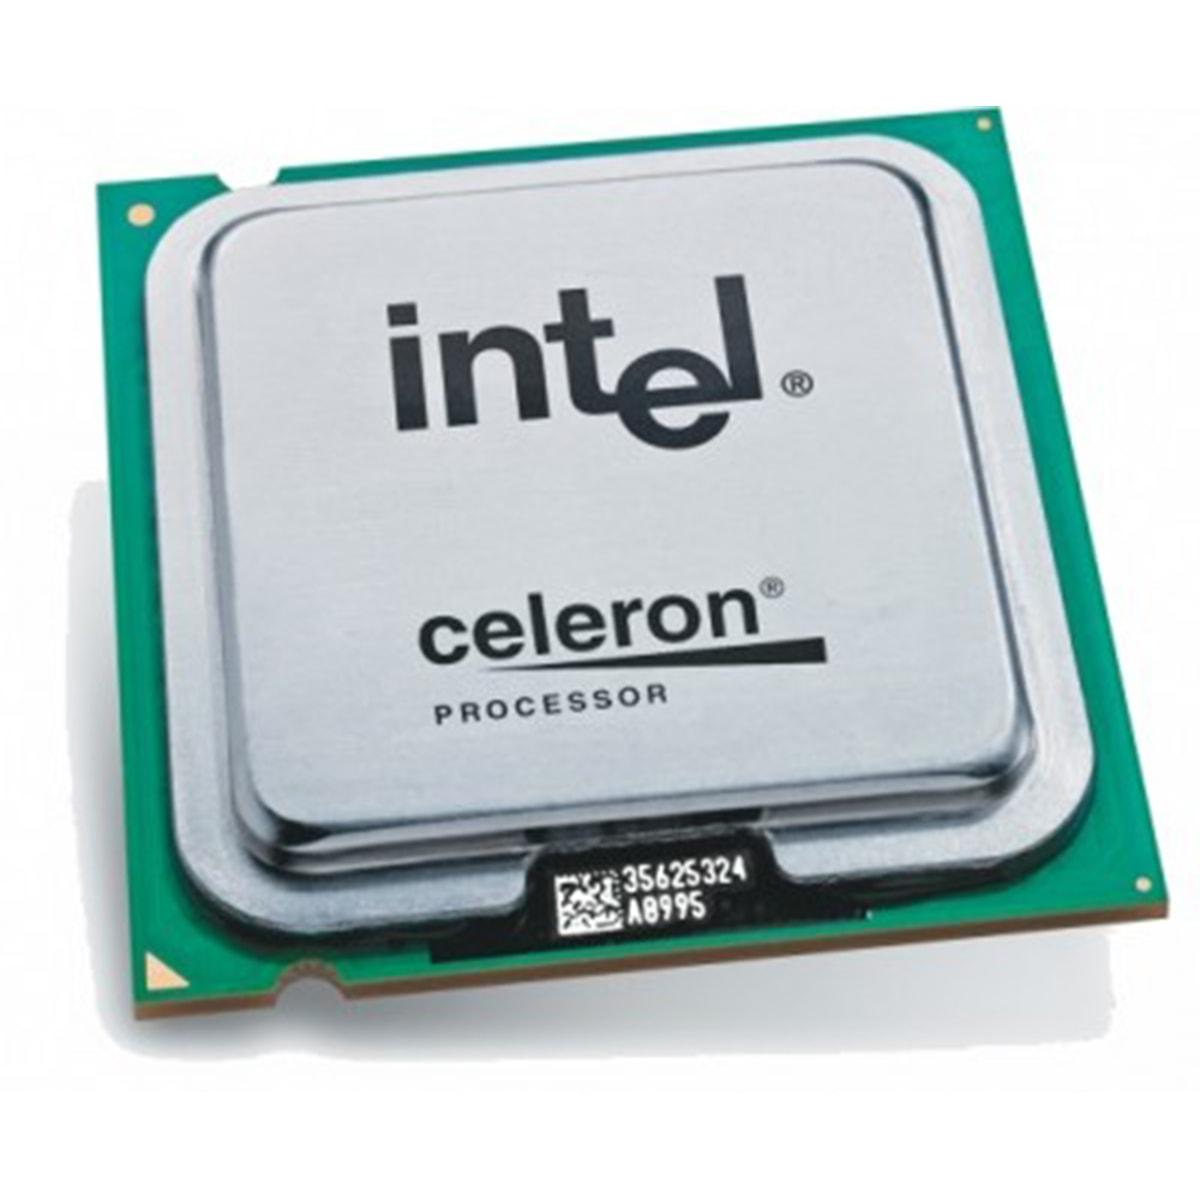 Processador Intel Celeron 450 2,20Ghz 512Kb Cache 800MHz - Socket 775 - Seminovo